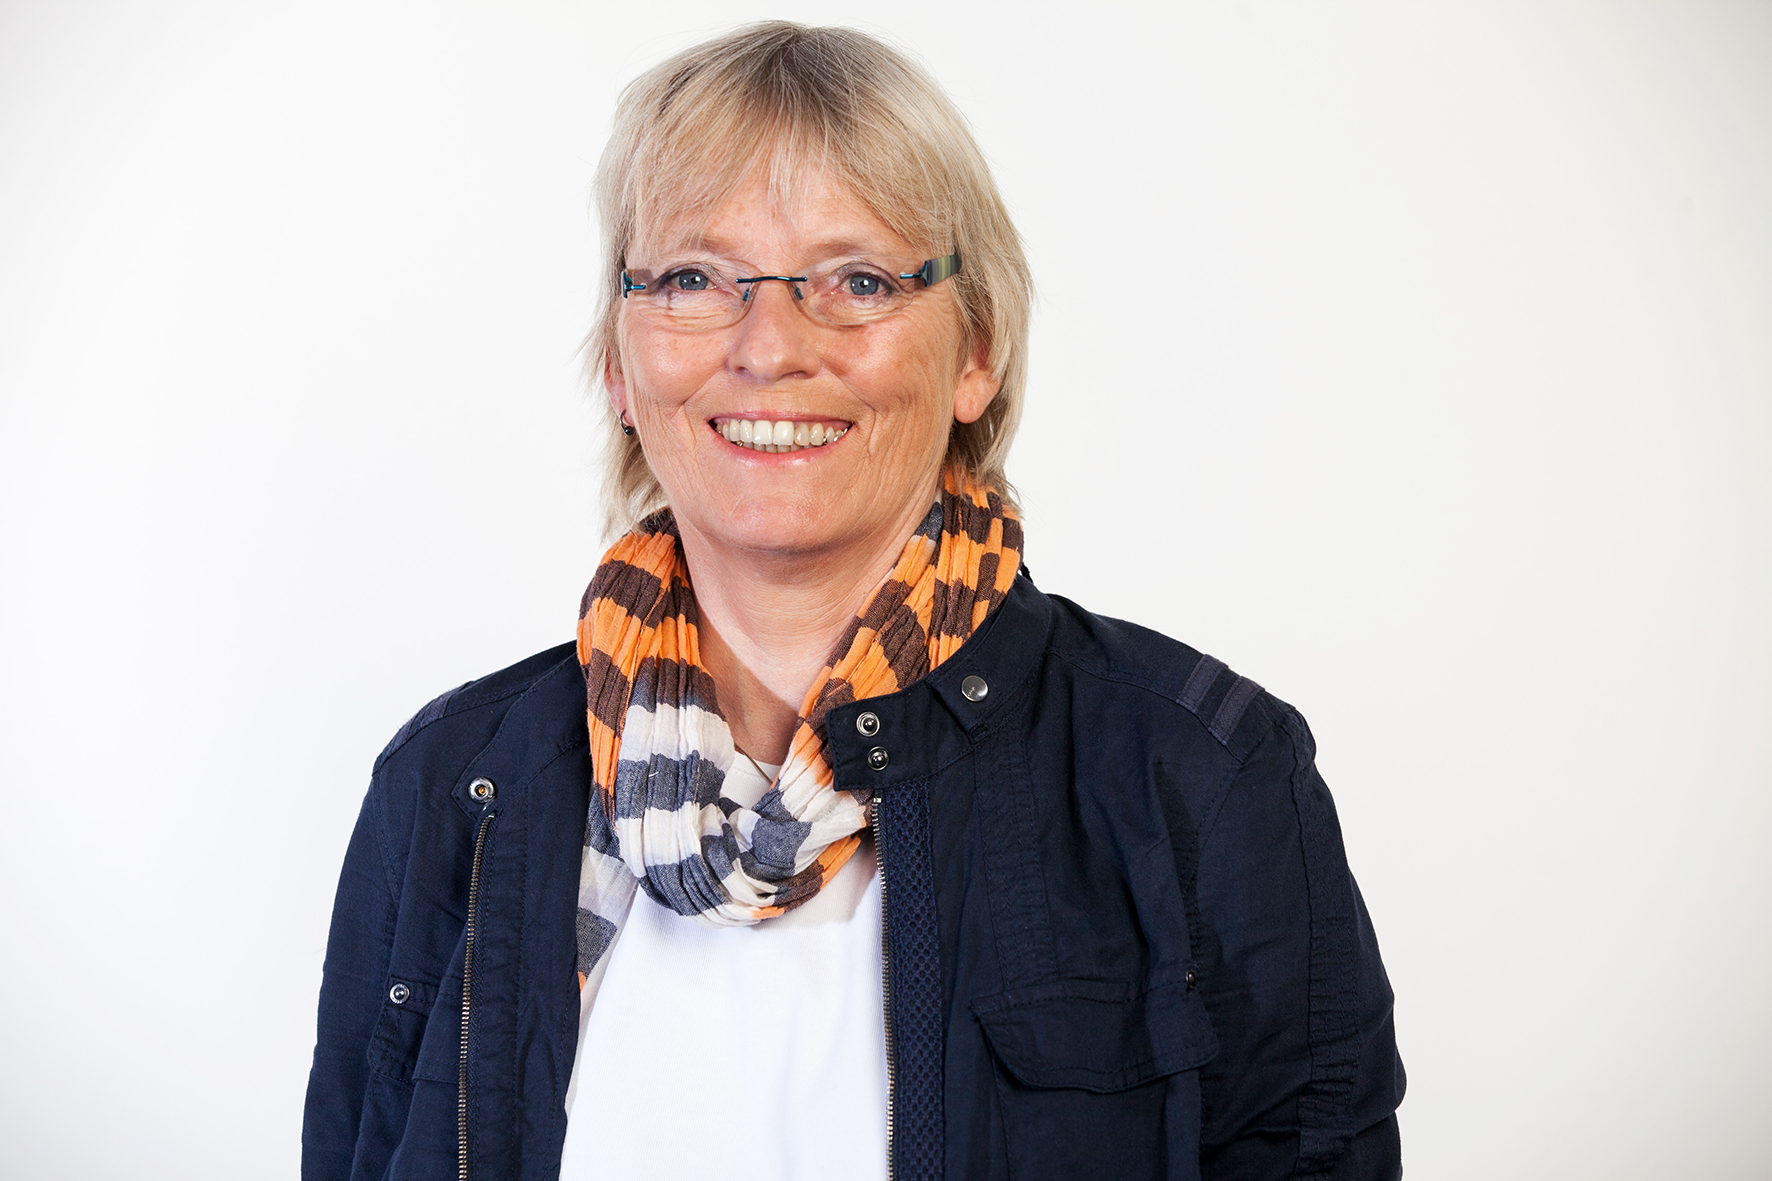 Carolina Brauckmann